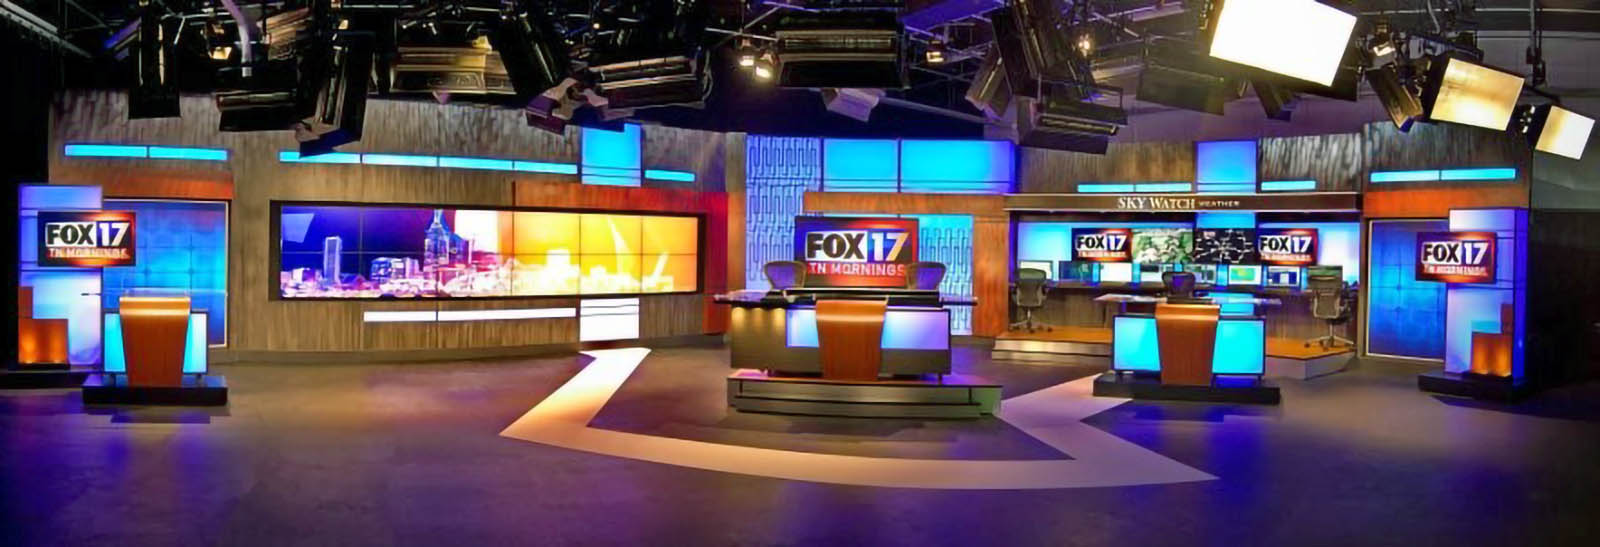 WXMI Fox 17 News Live Coverage Studio